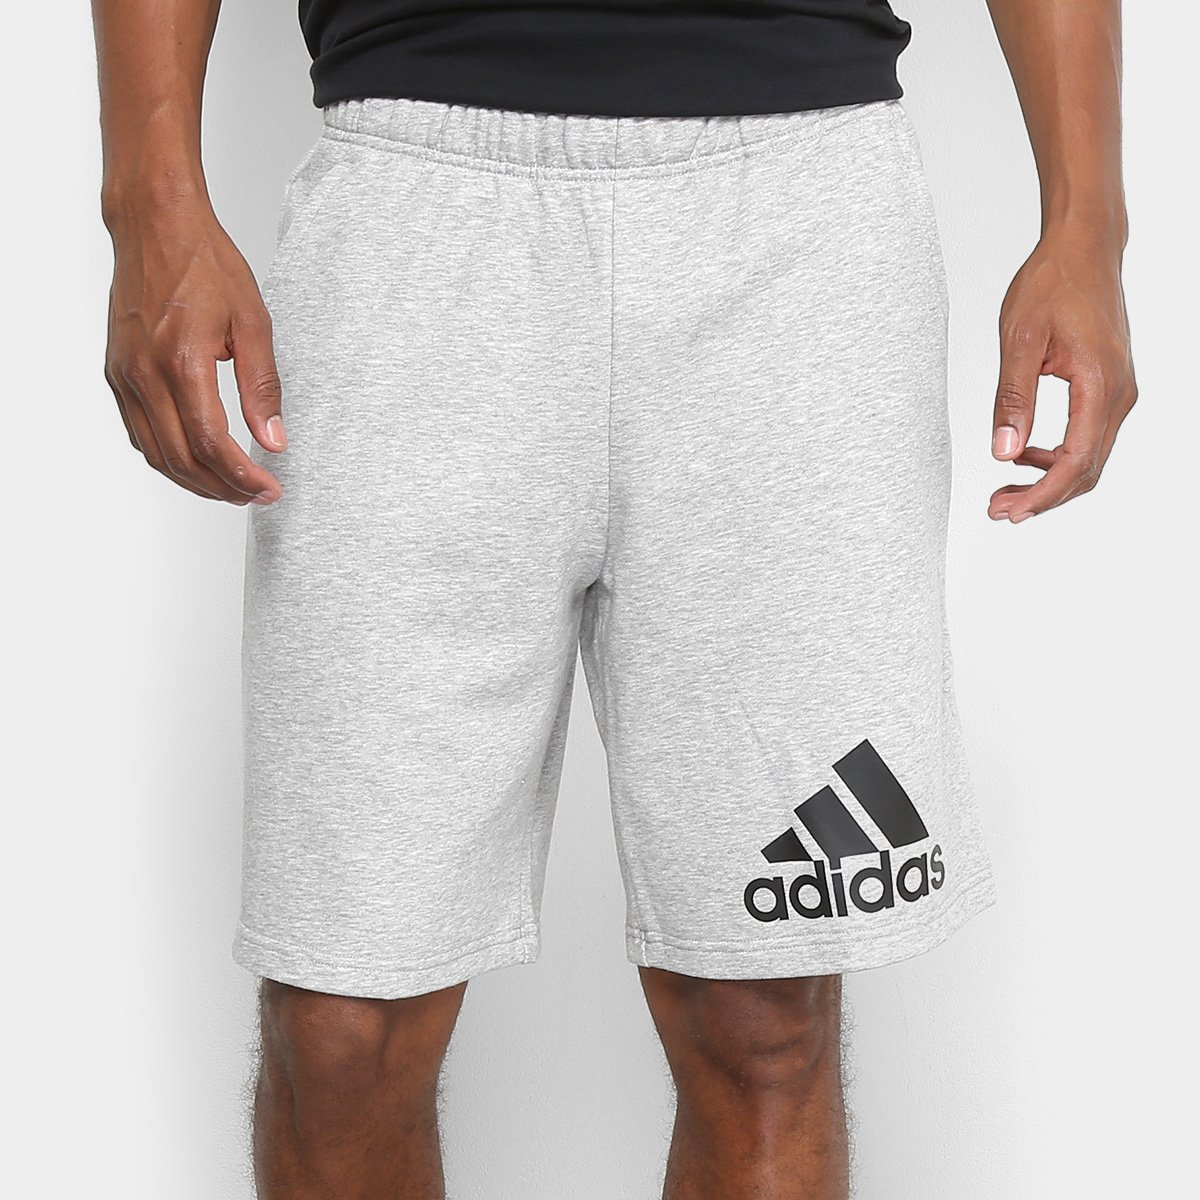 Preto Adidas Agora Compre Knit Moletom Bermuda Masculino Cinza E 18qYnx